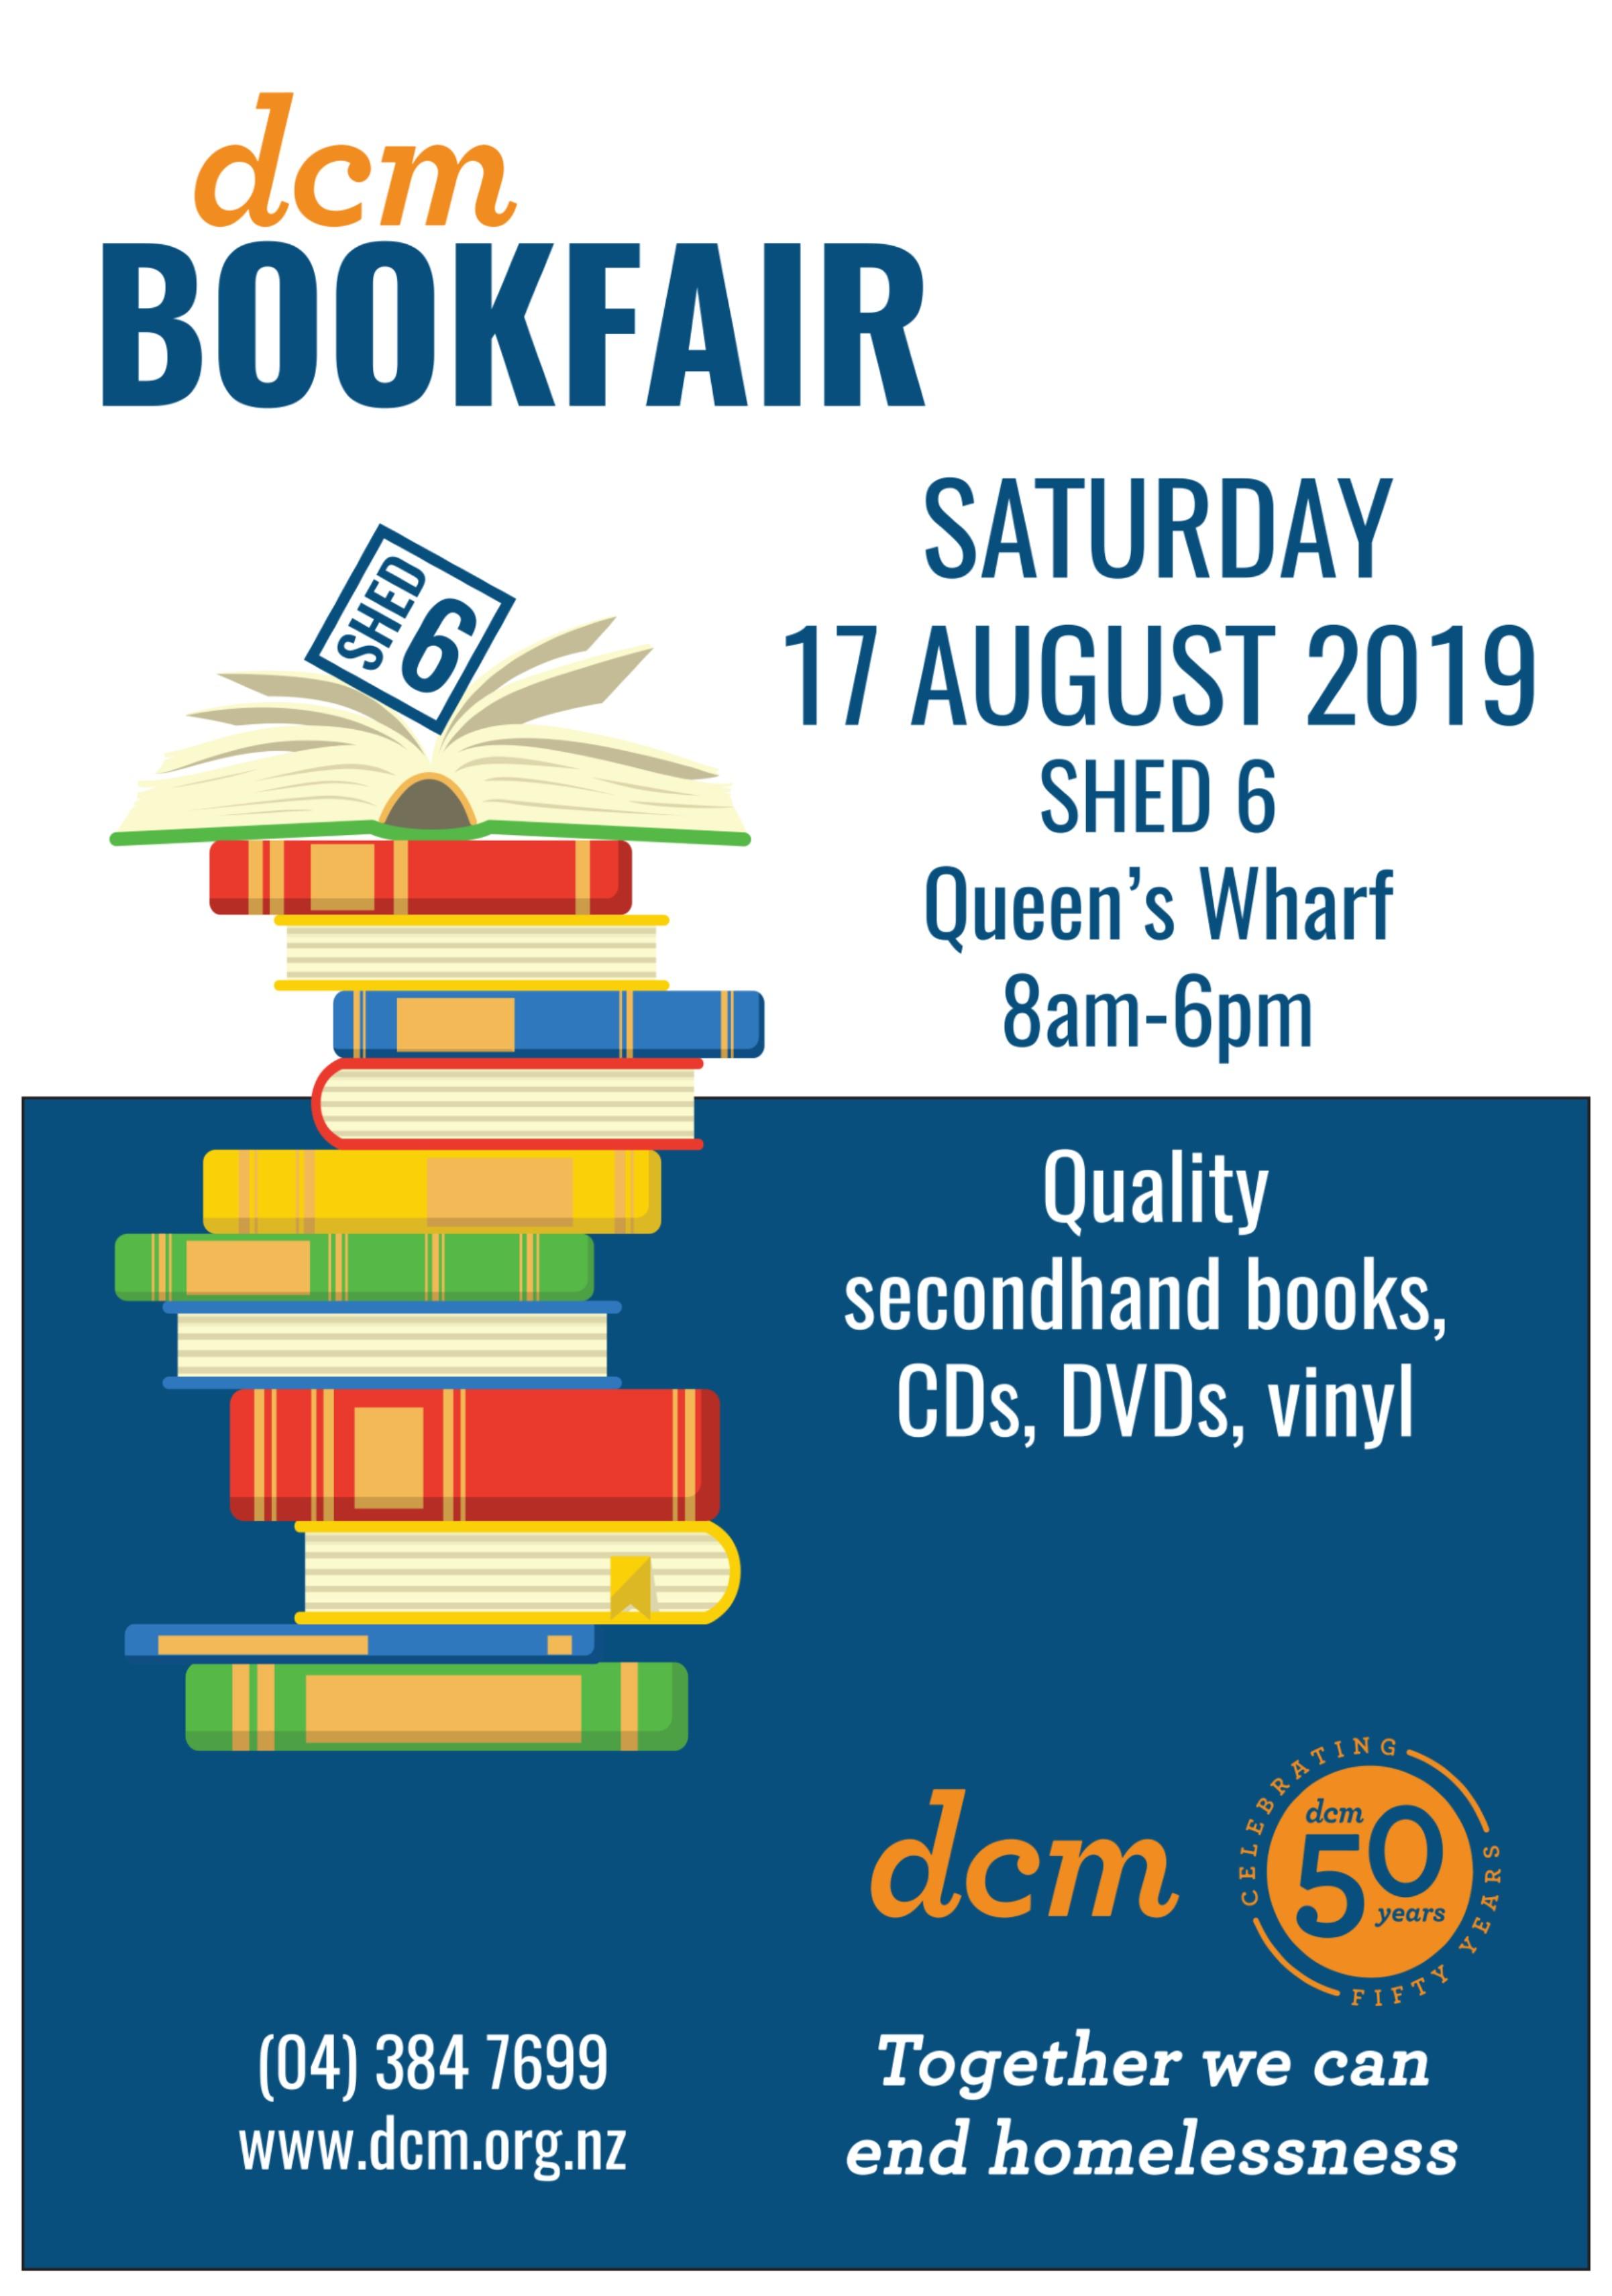 DCM Bookfair 2019 - Poster.jpg